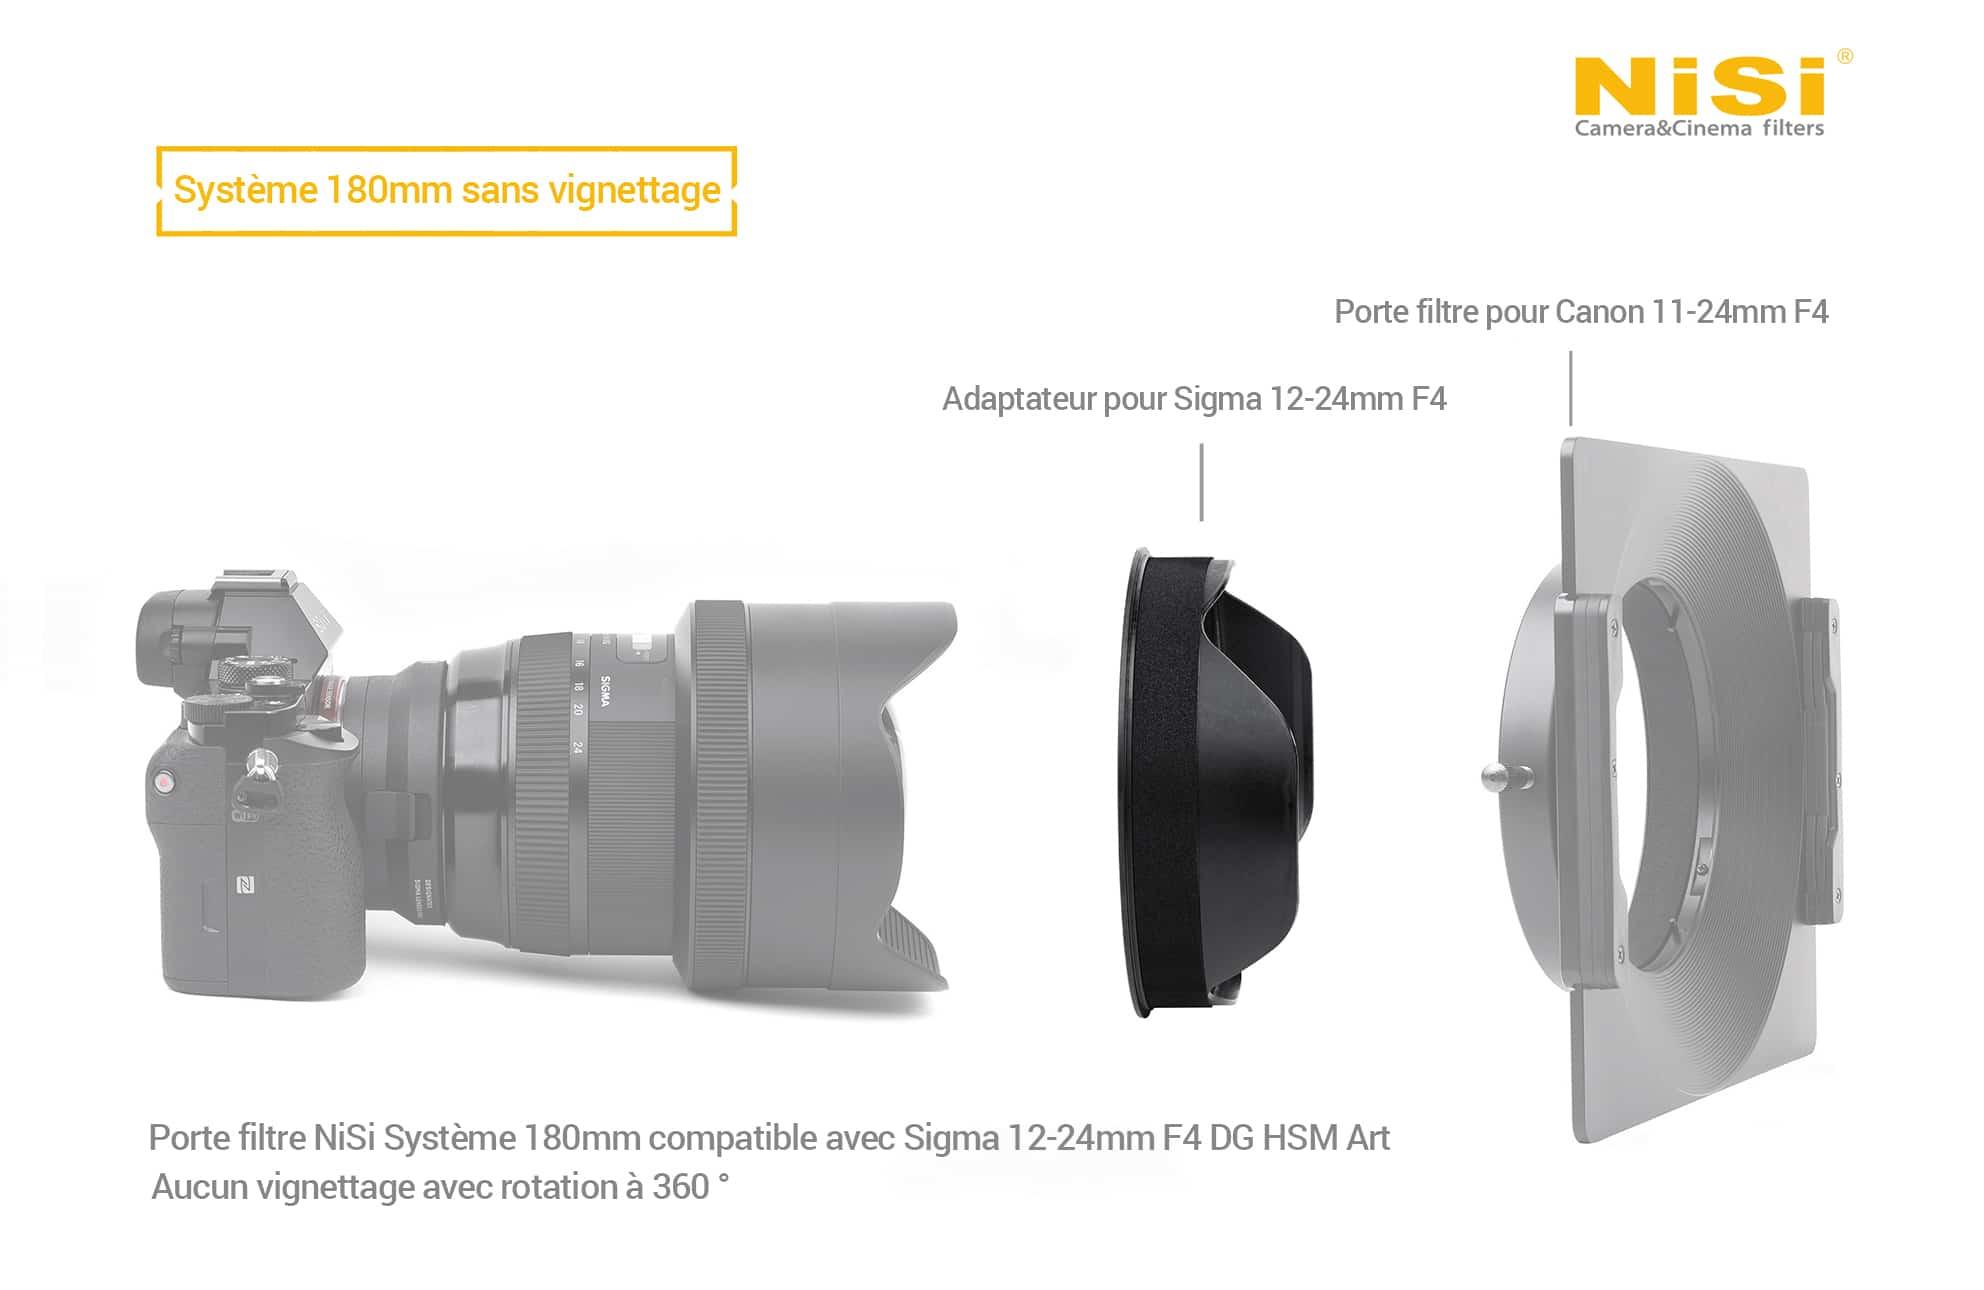 Adaptateur Sigma 12-24mm Nisi